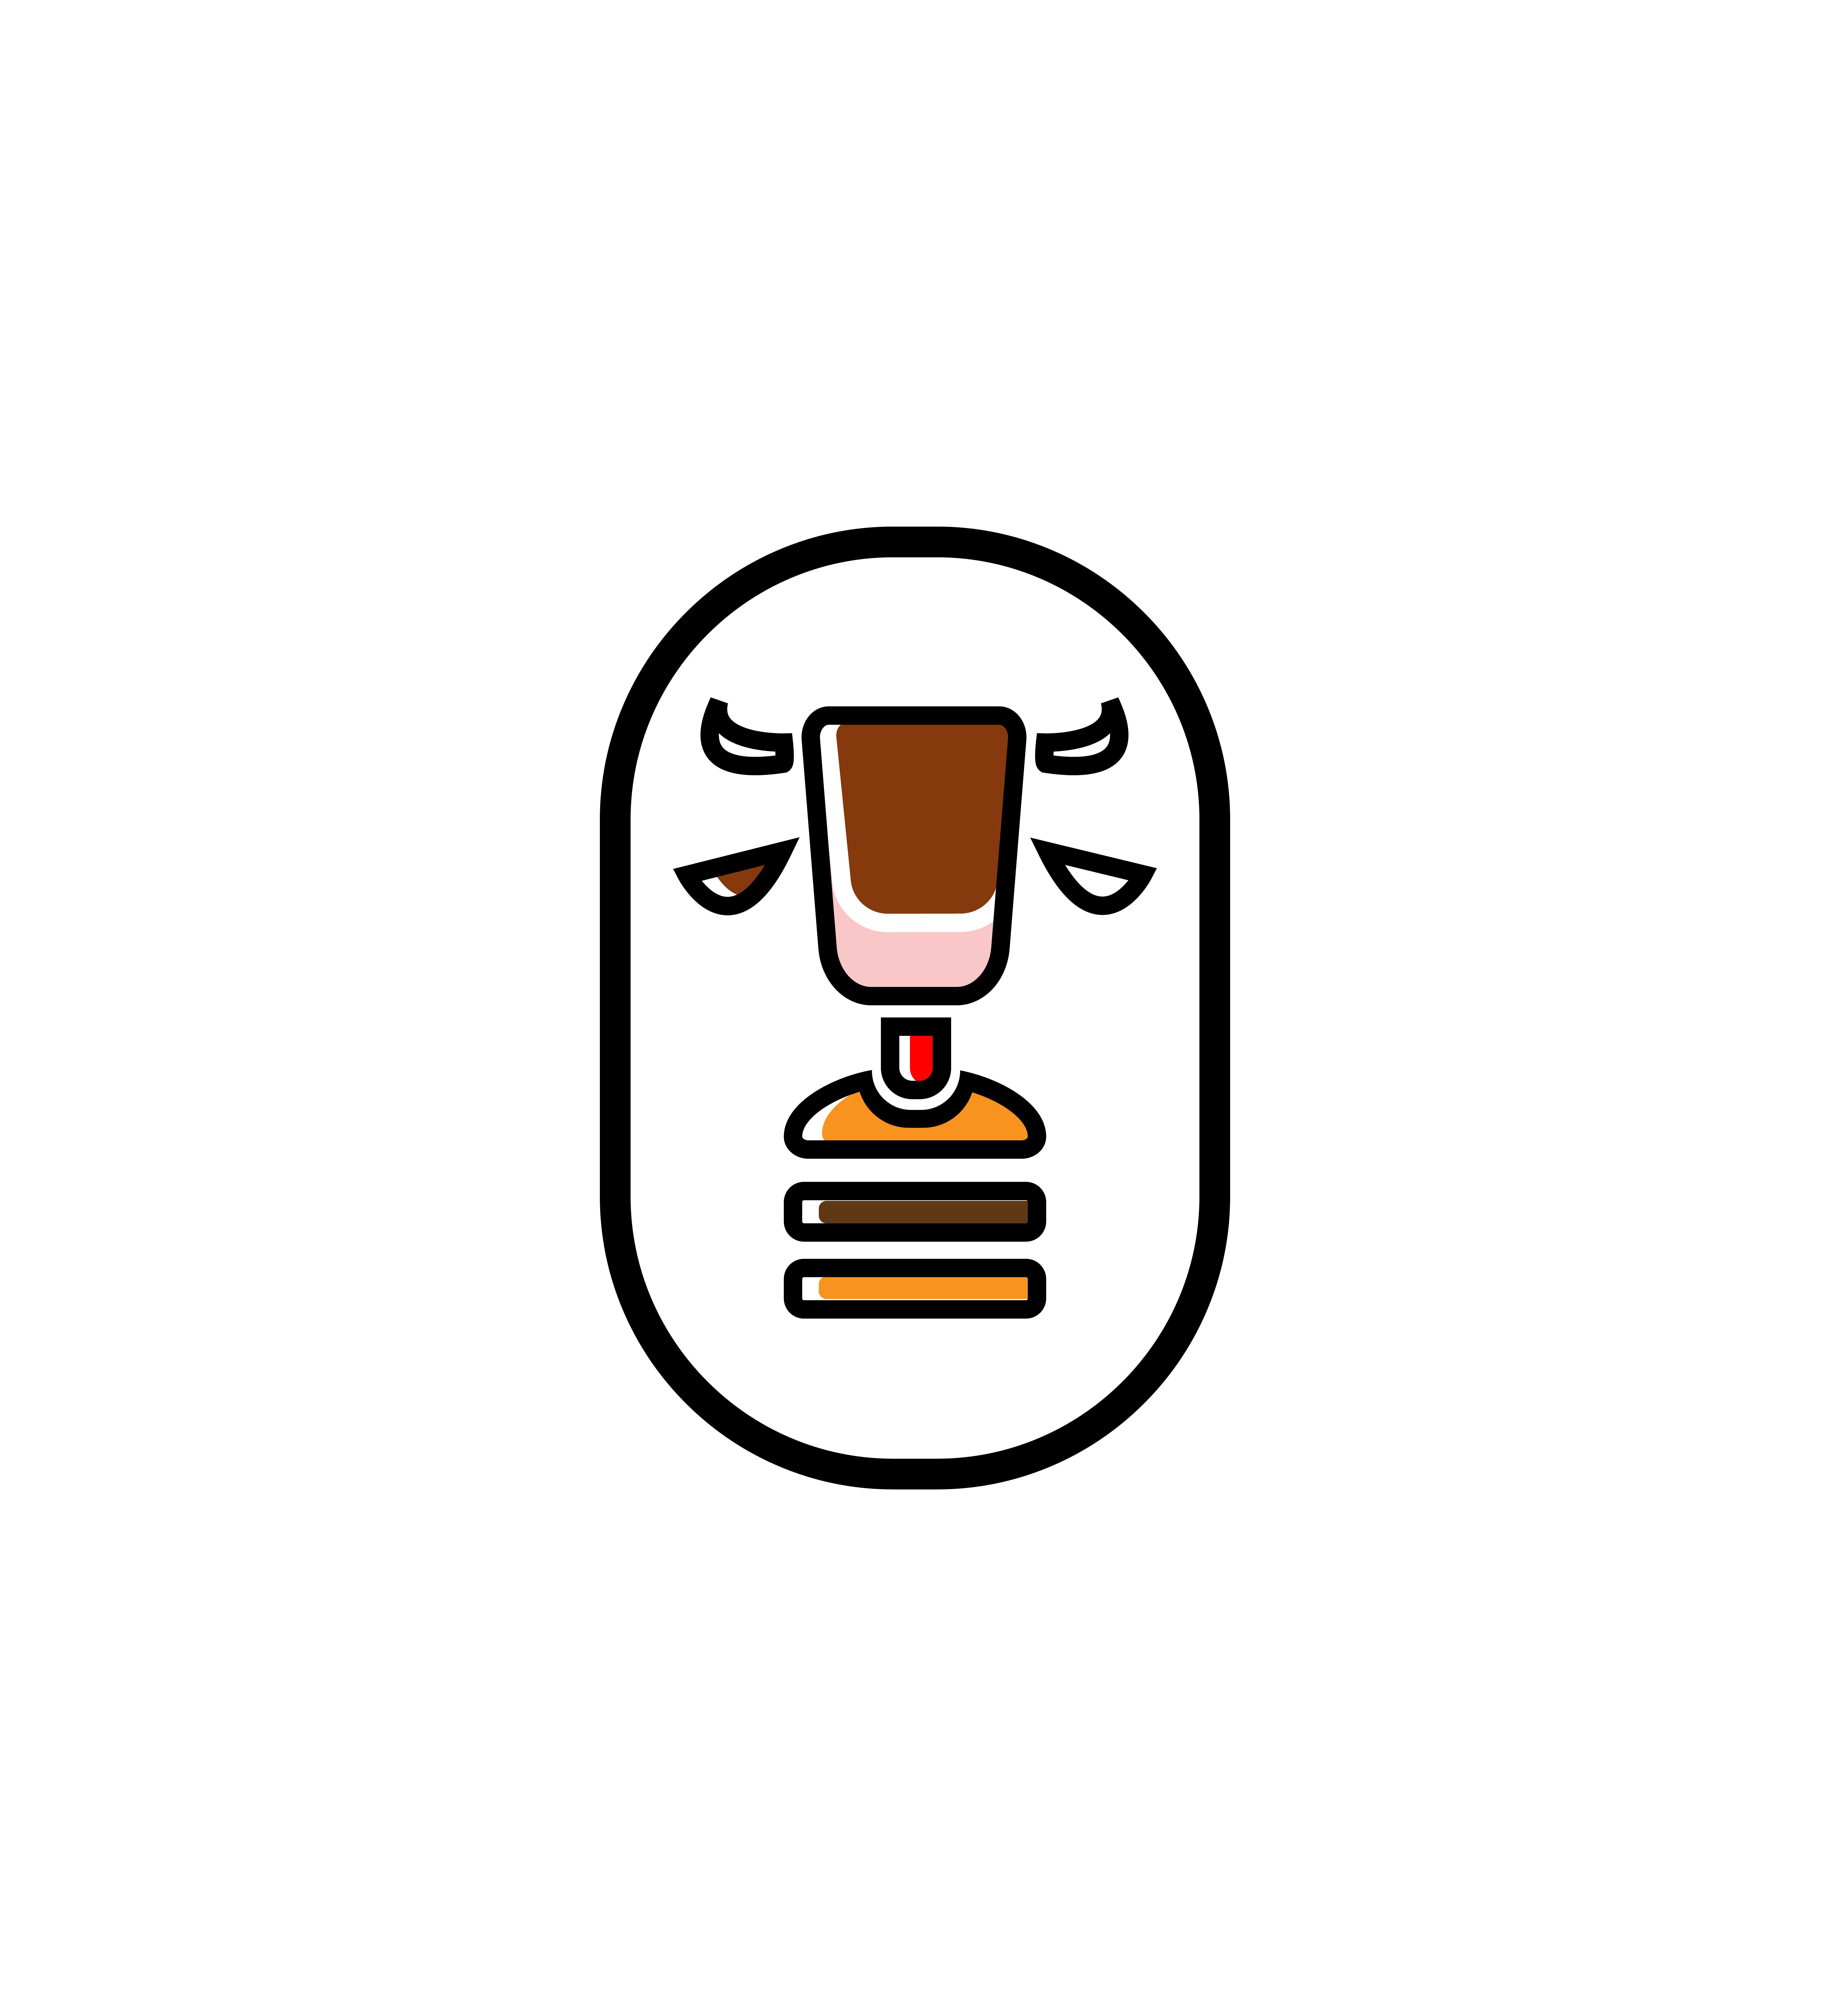 Логотип для Бургерной с Пекарней фото f_6485e1b1e3d8c645.jpg